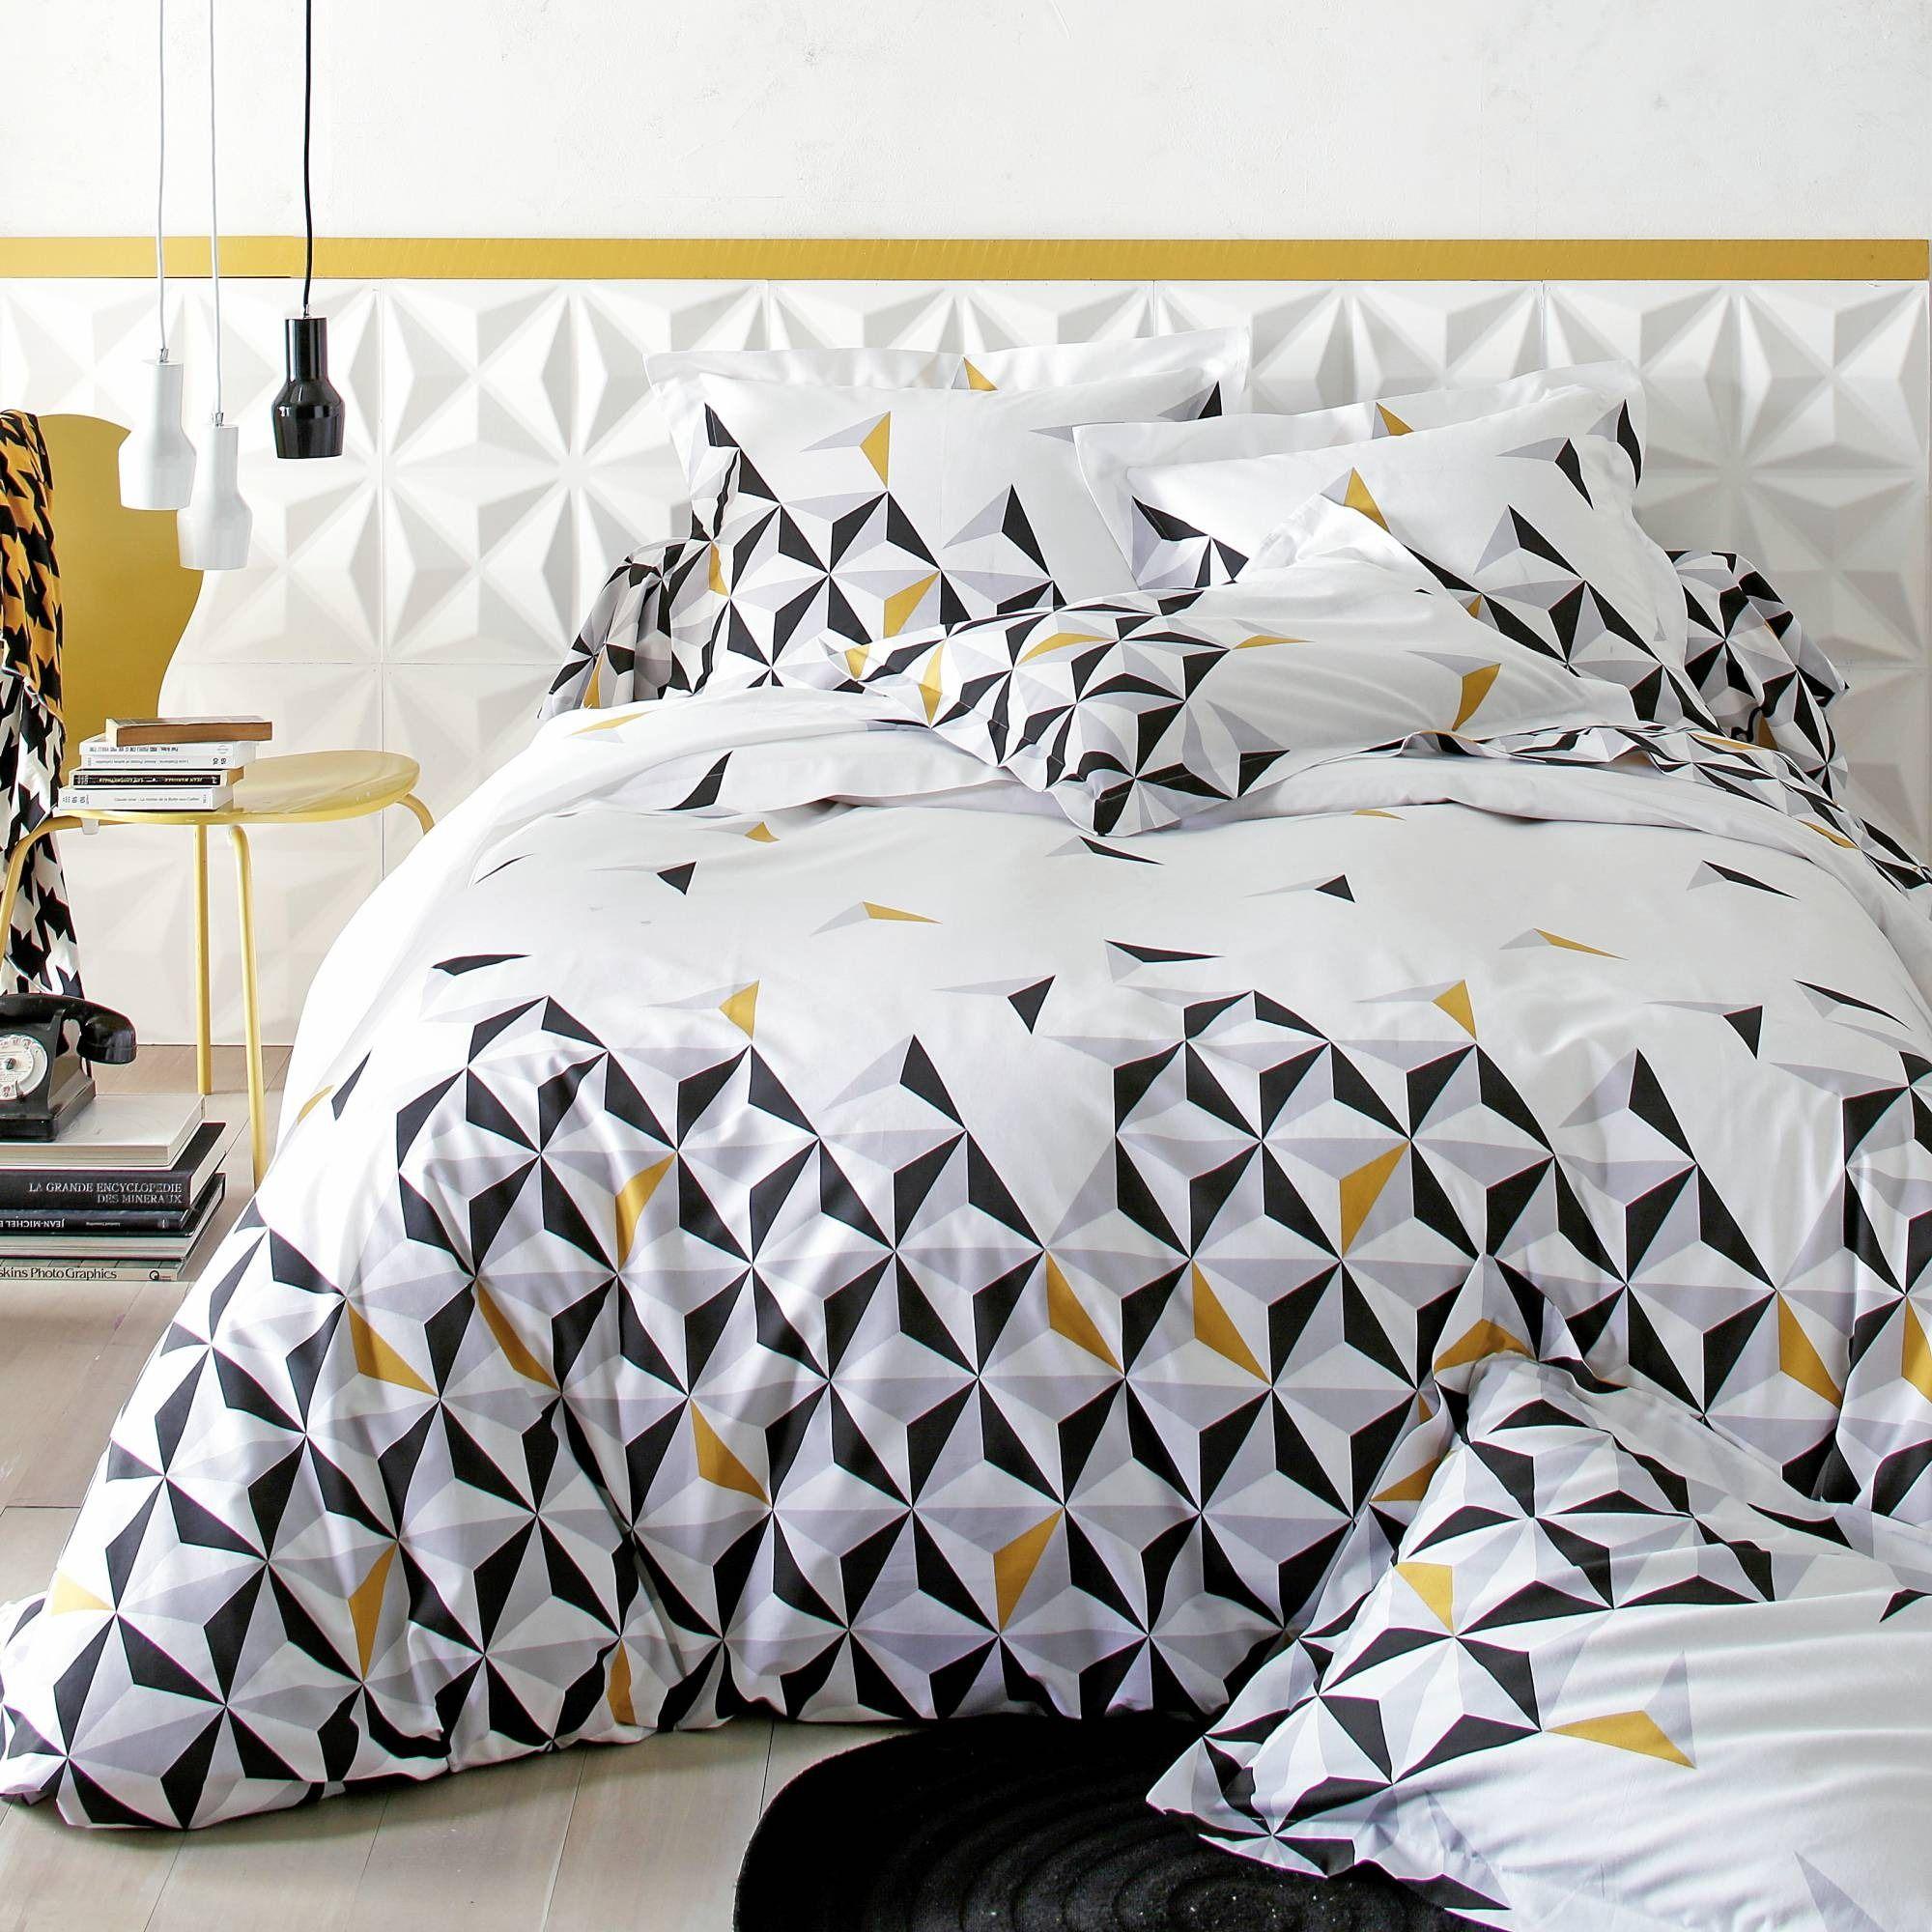 housse de couette tumblr si55 jornalagora. Black Bedroom Furniture Sets. Home Design Ideas